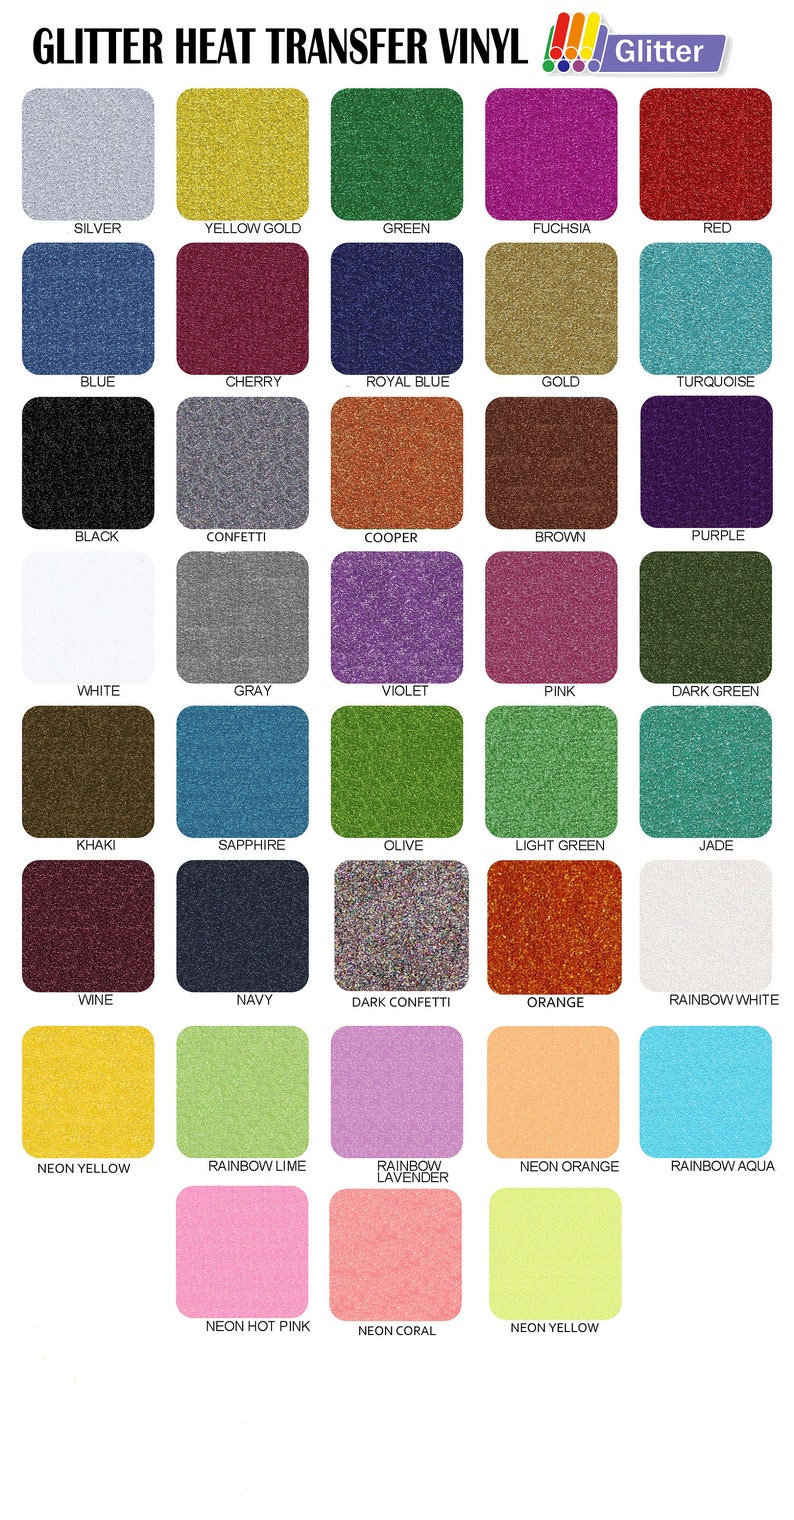 12 x 20 Glitter Heat Transfer Vinyl  37 Colors image 0